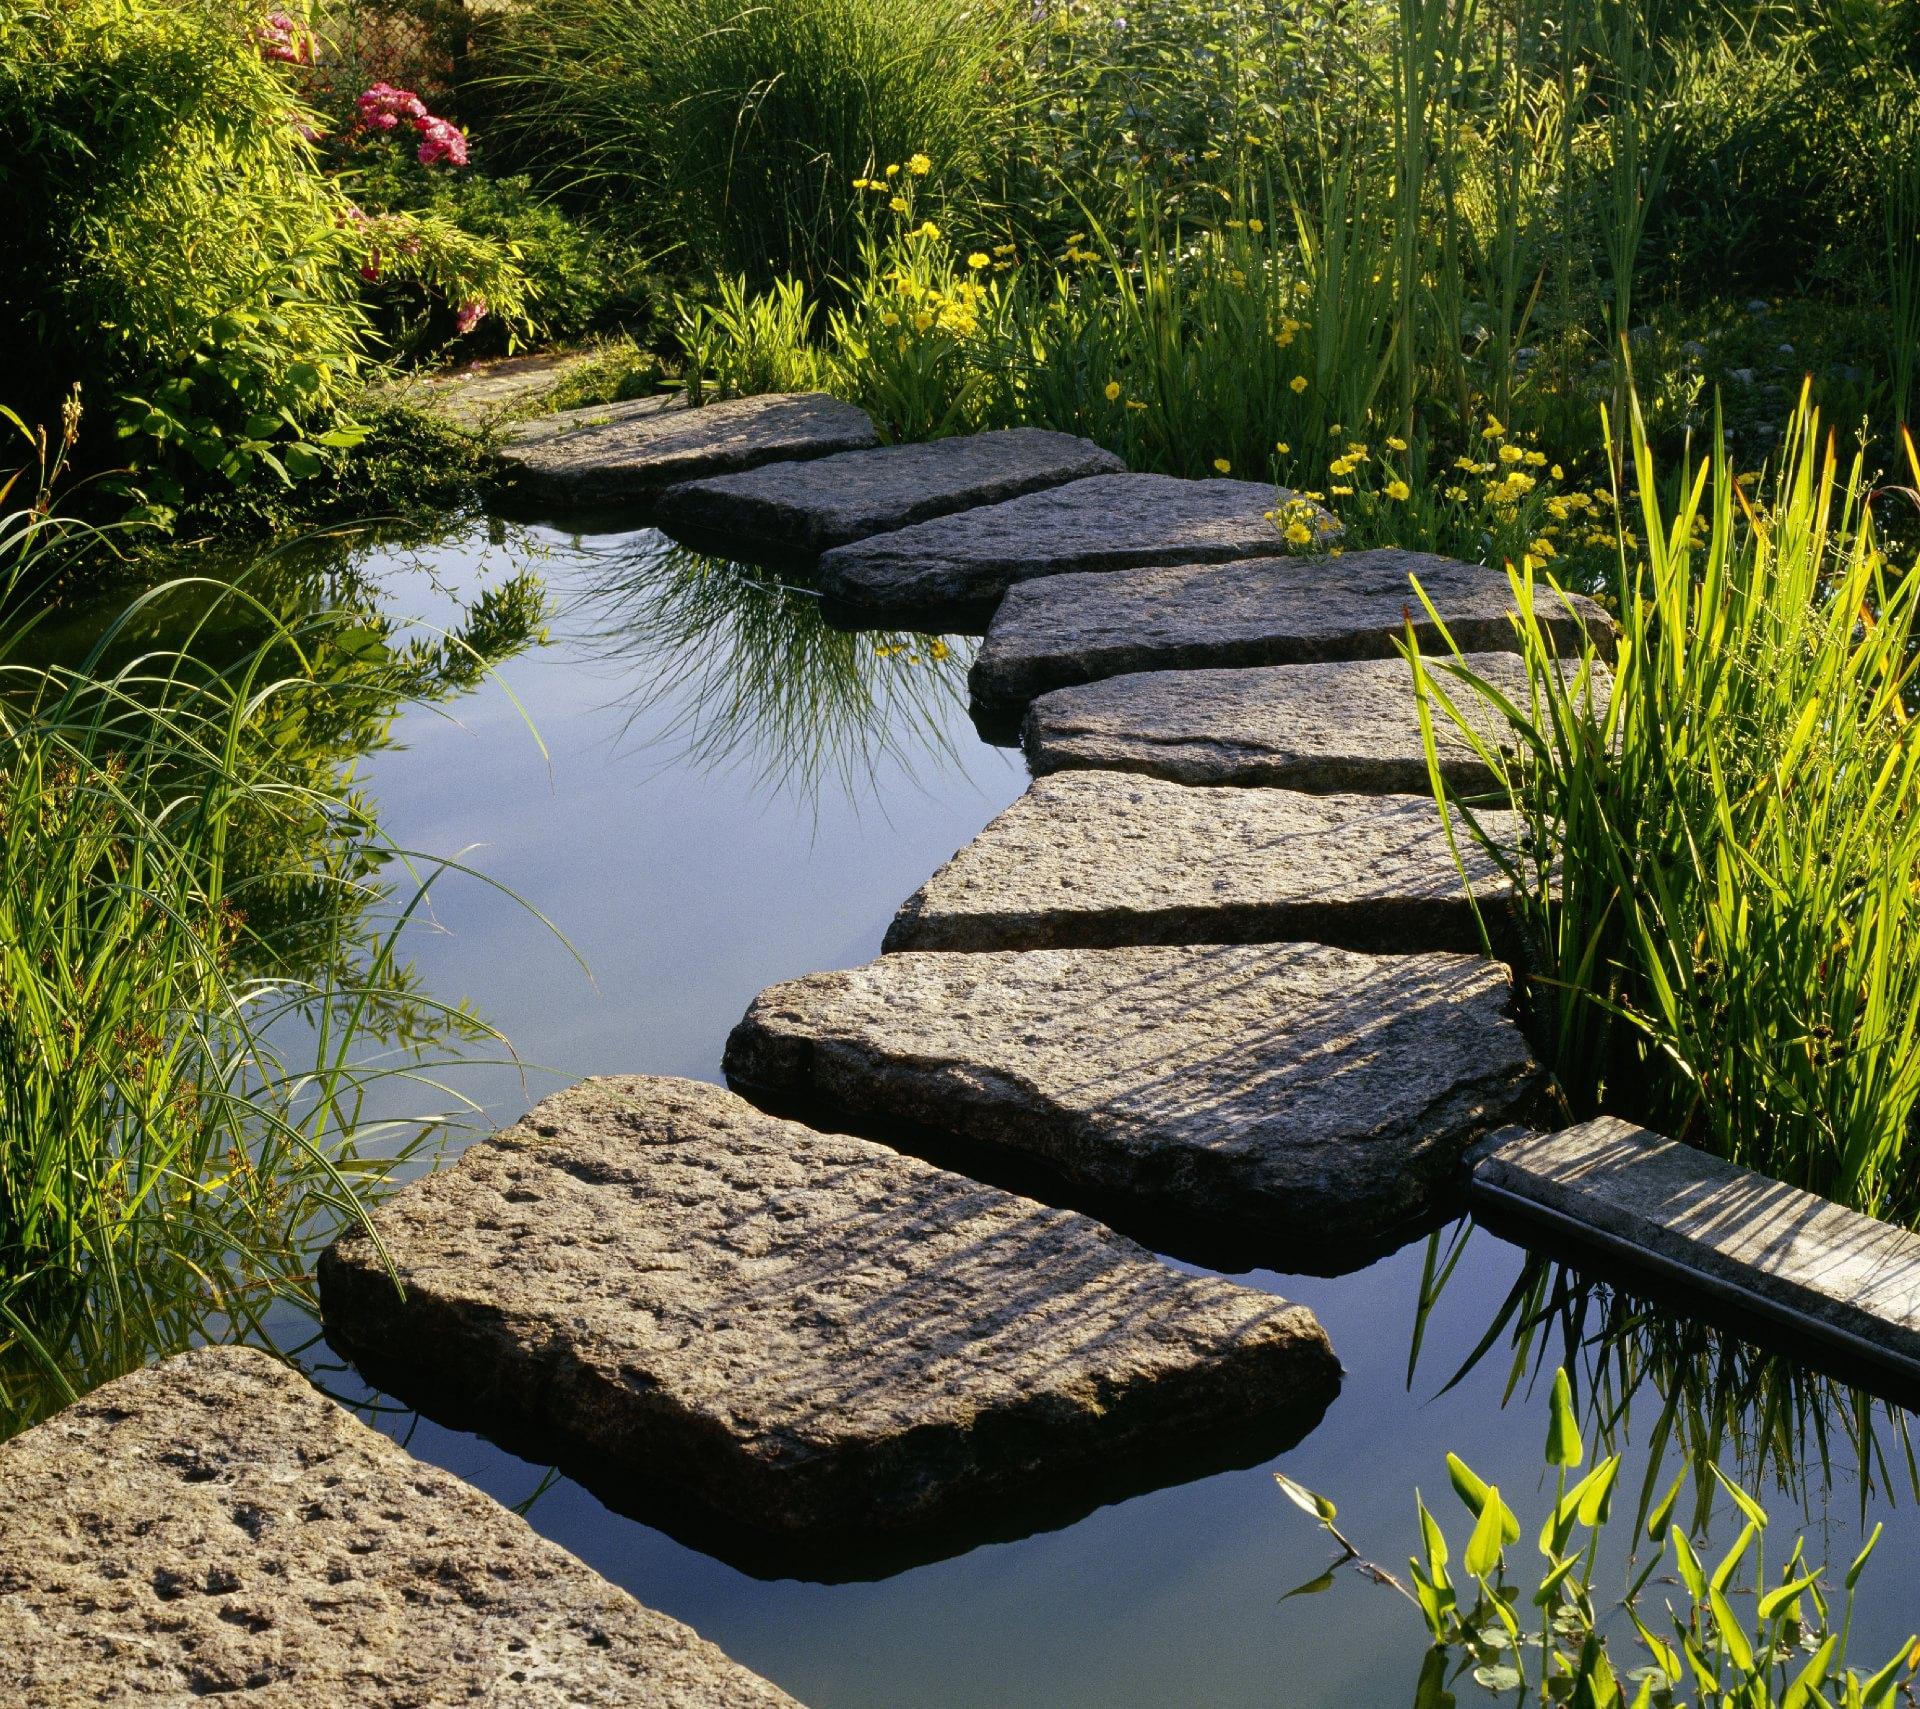 Wege-im-Garten